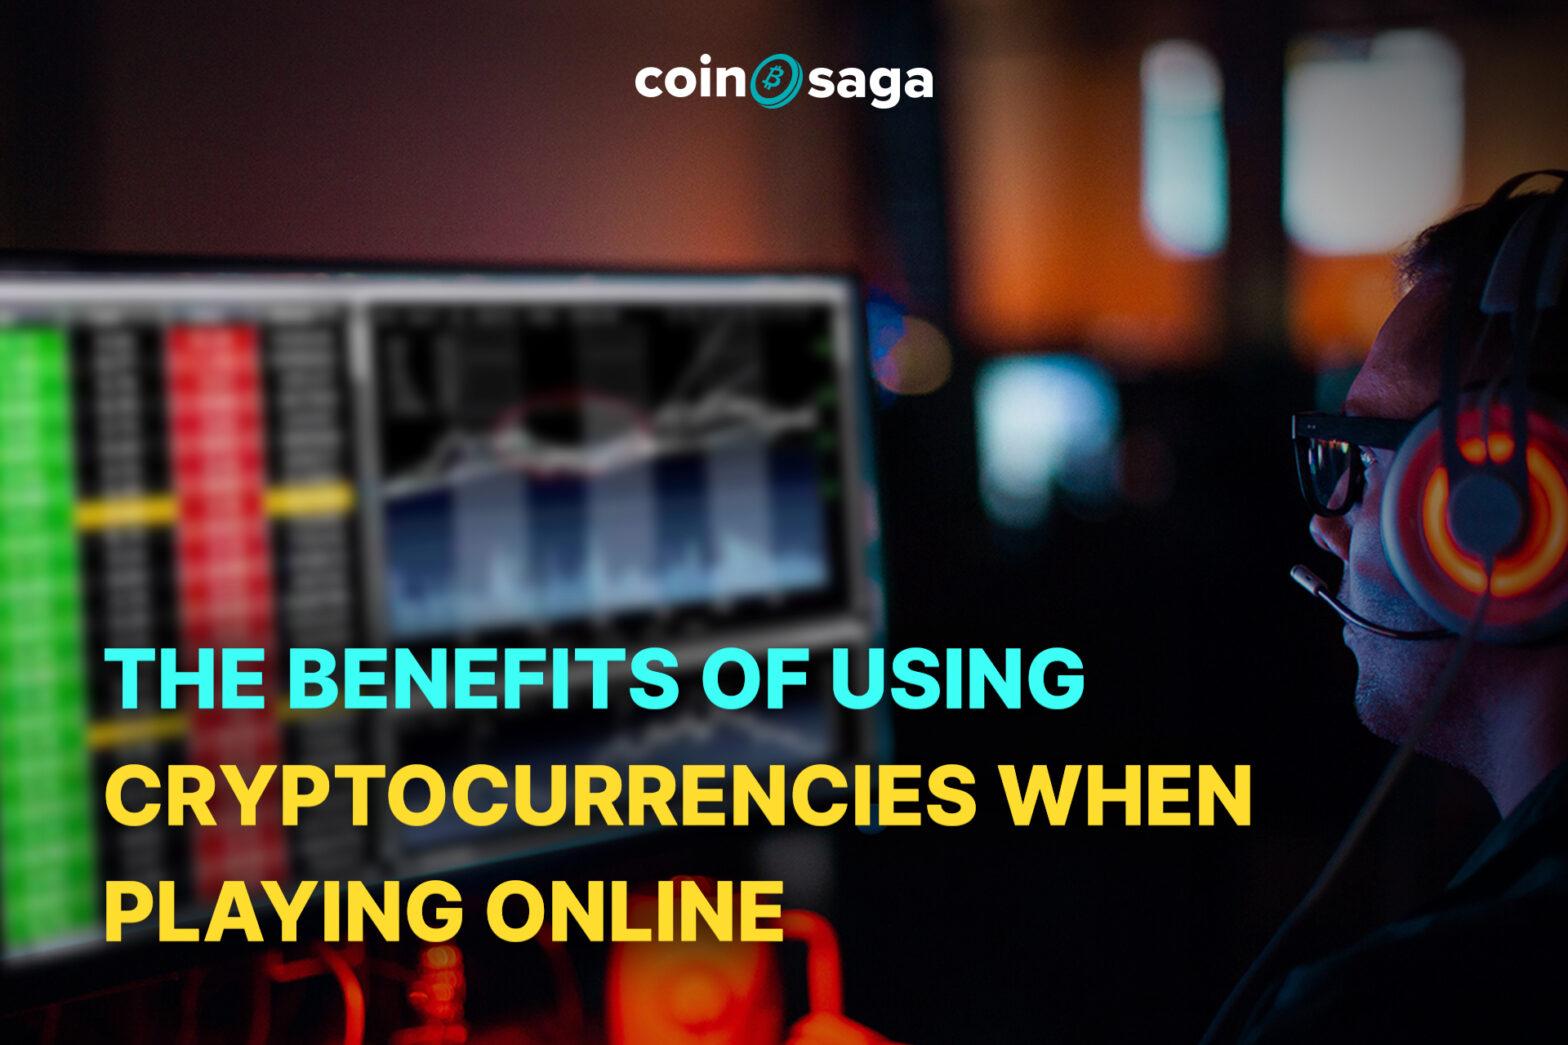 Benefits of Using Cryptocurrencies